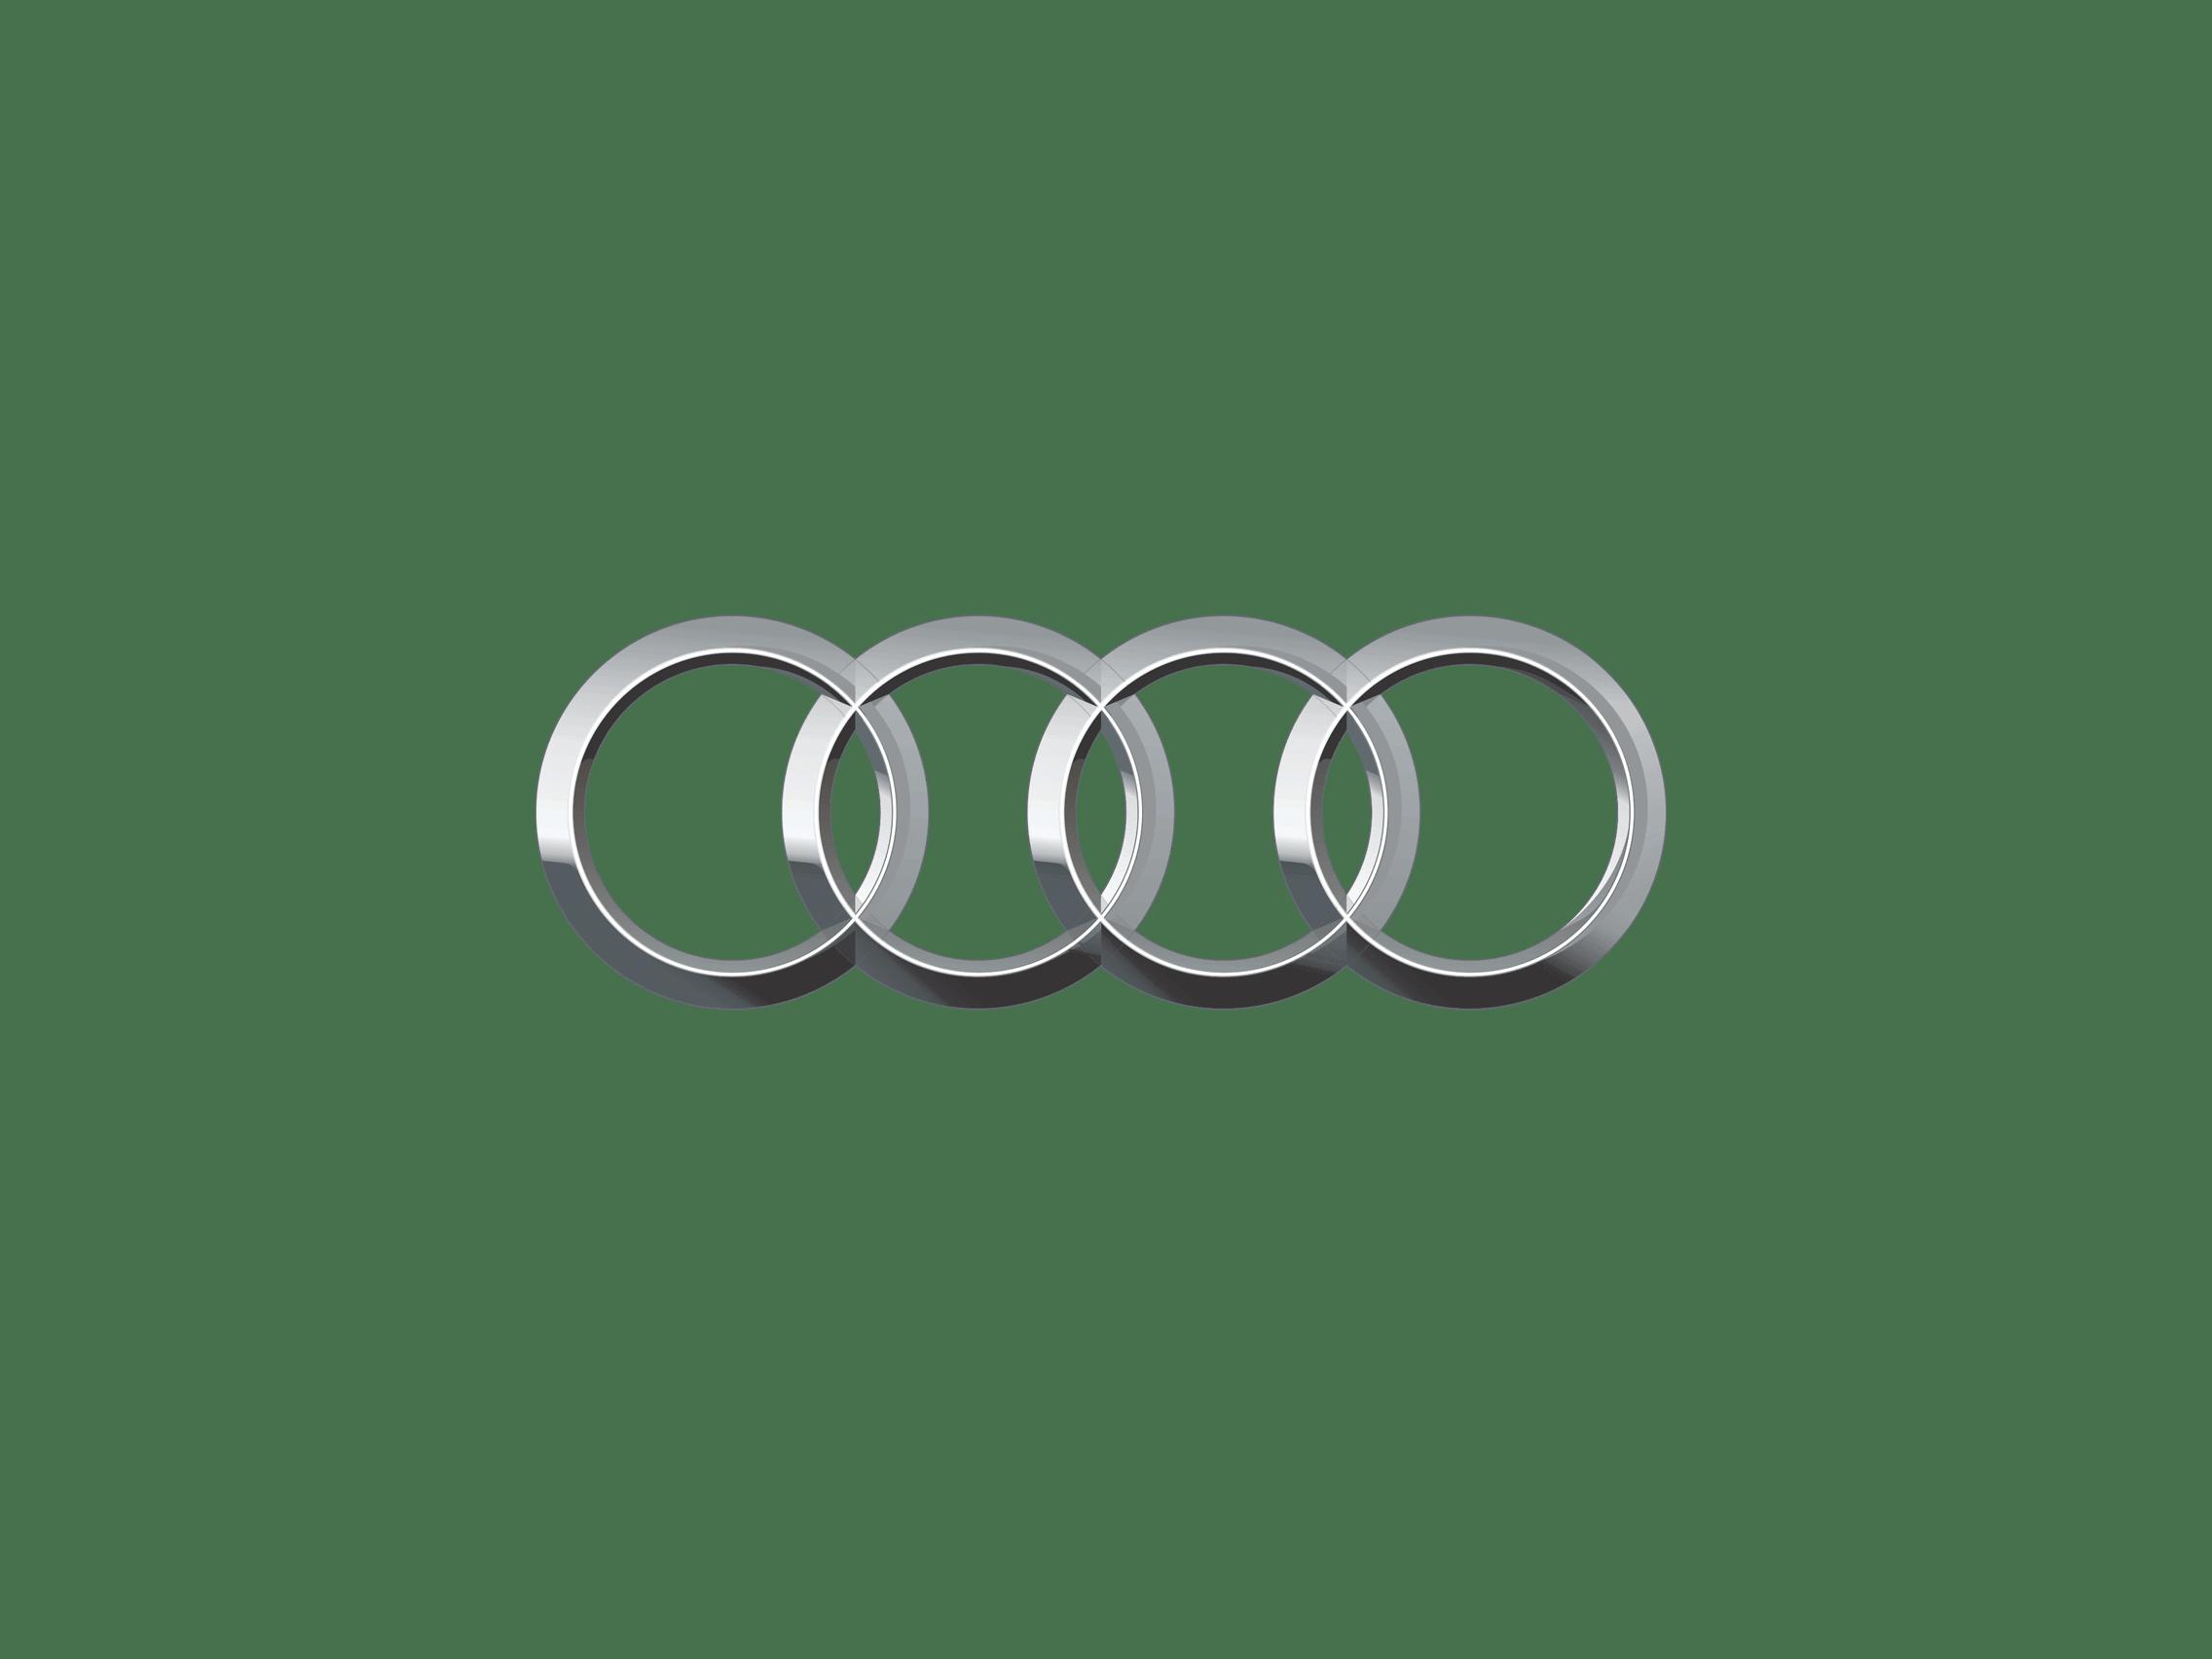 Great Car Wallpapers Audi Logo Png Free Transparent Png Logos